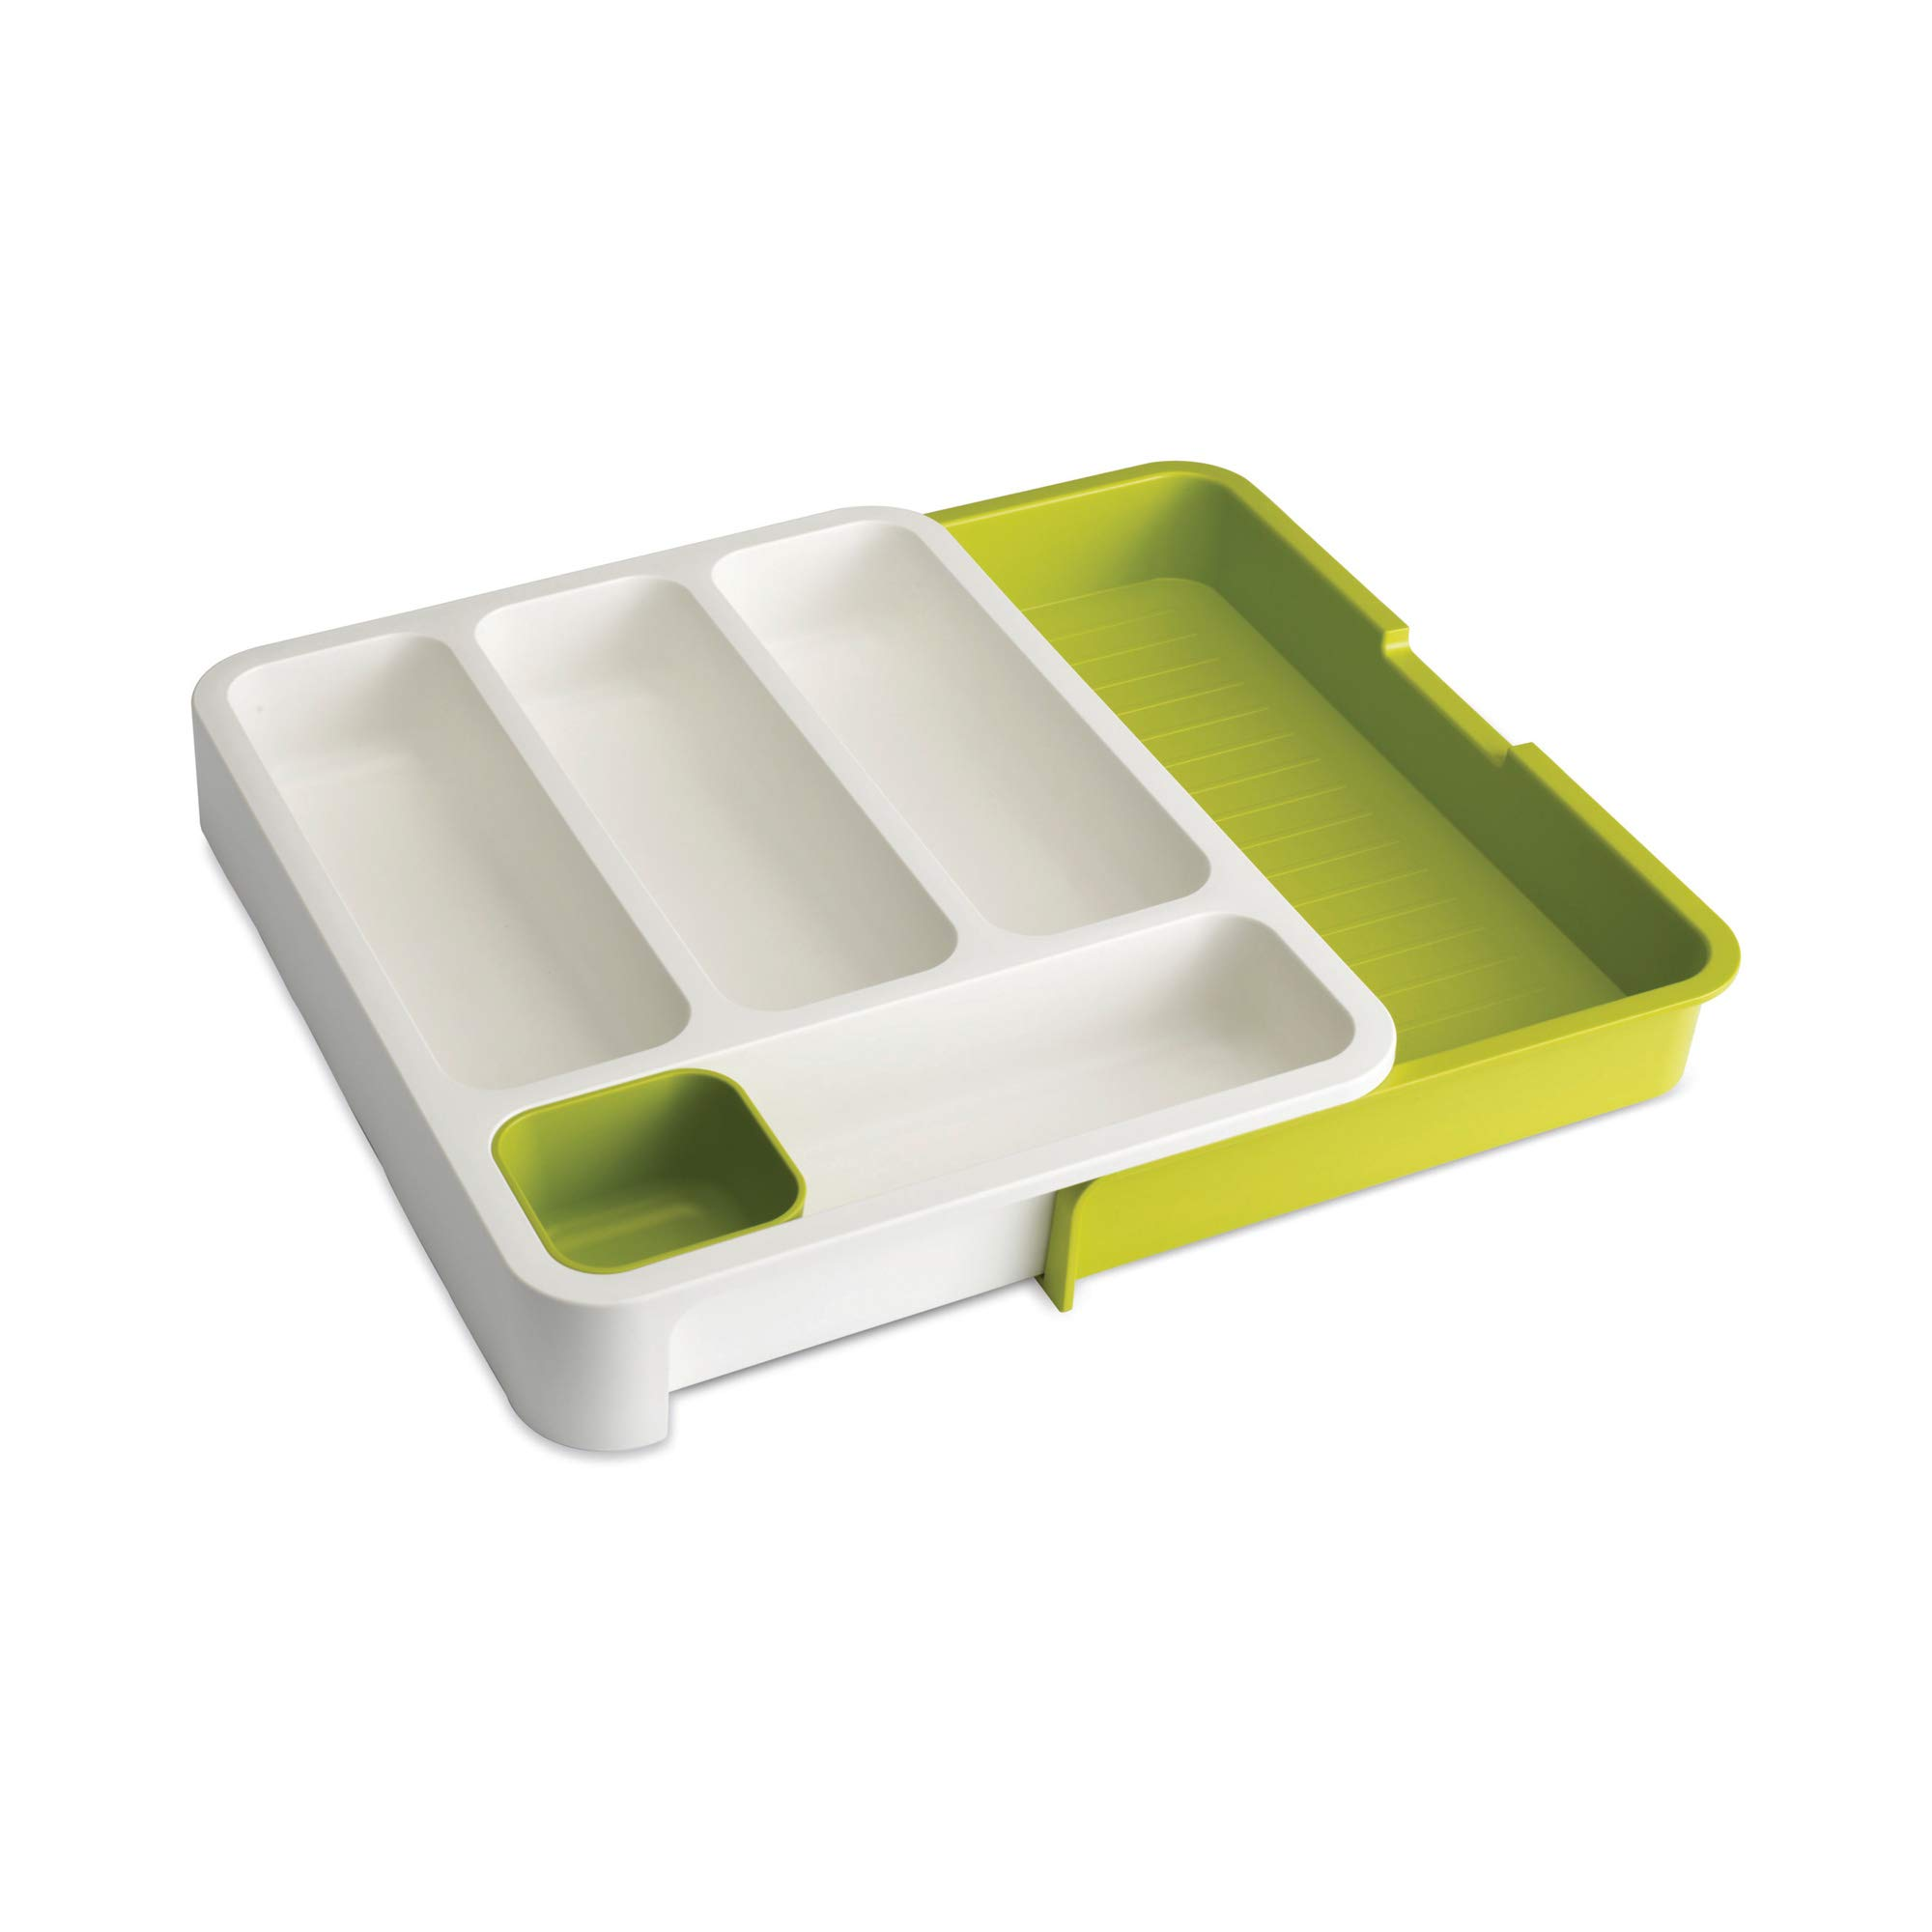 Joseph Joseph 85041 DrawerStore Expandable Cutlery Tray, Green